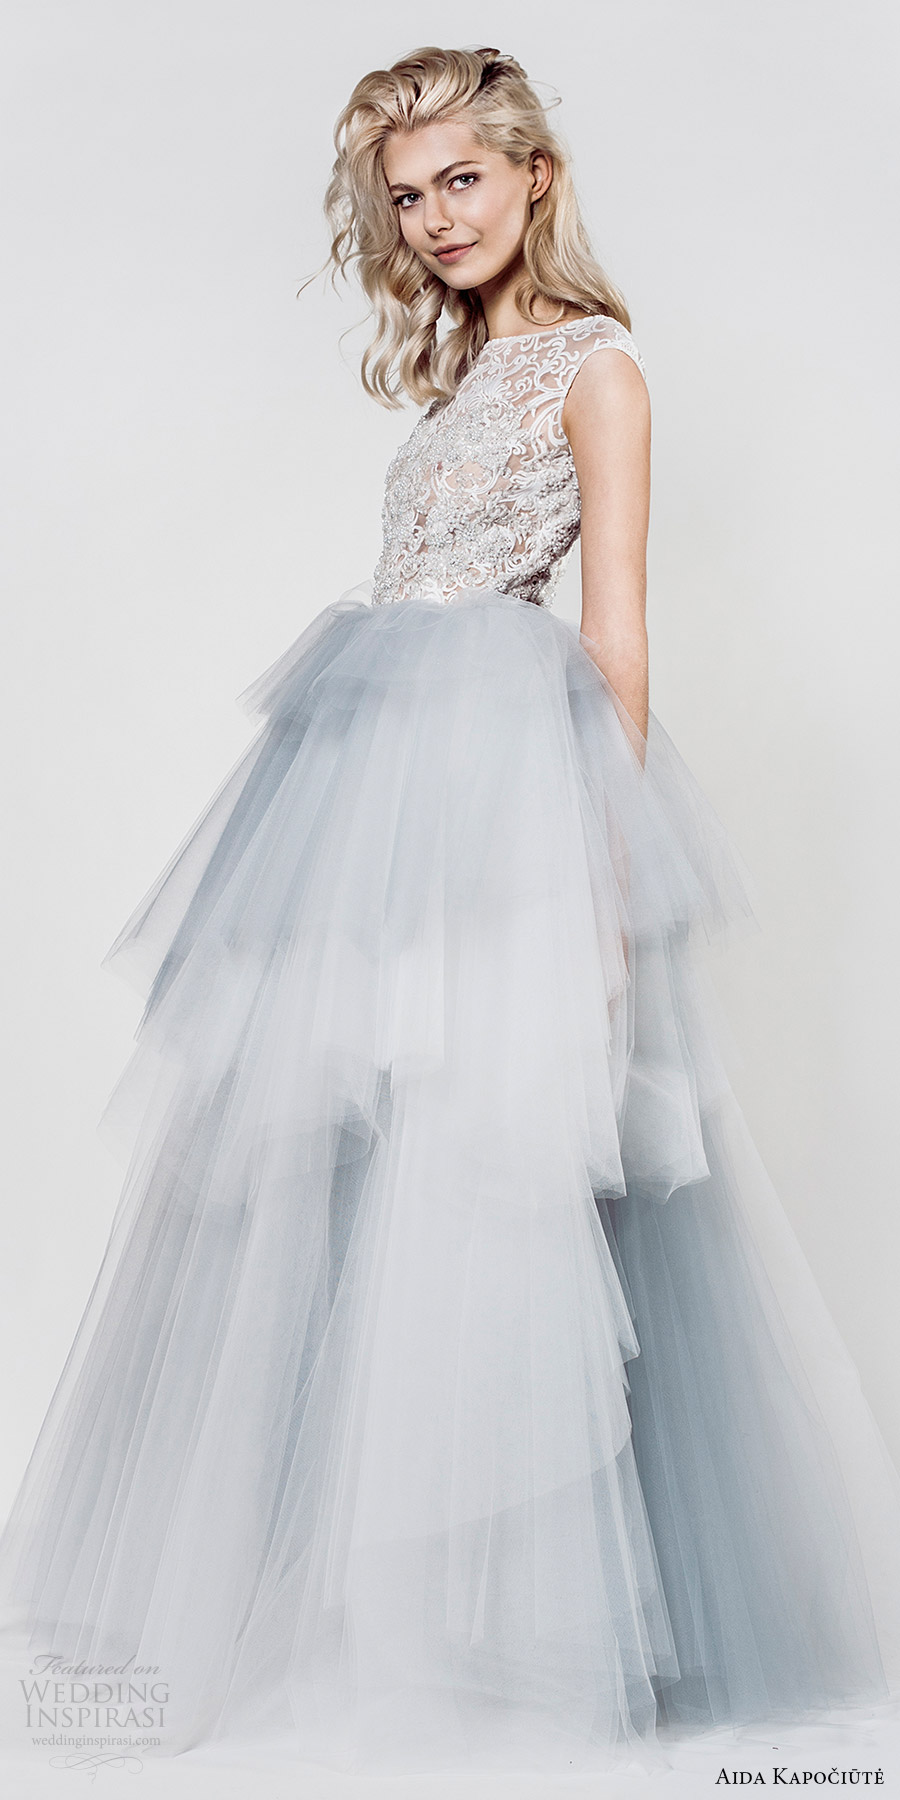 aida kapociute 2017 bridal sleeveless jewel neck lace bodice ball gown wedding dress (9) mv light blue color